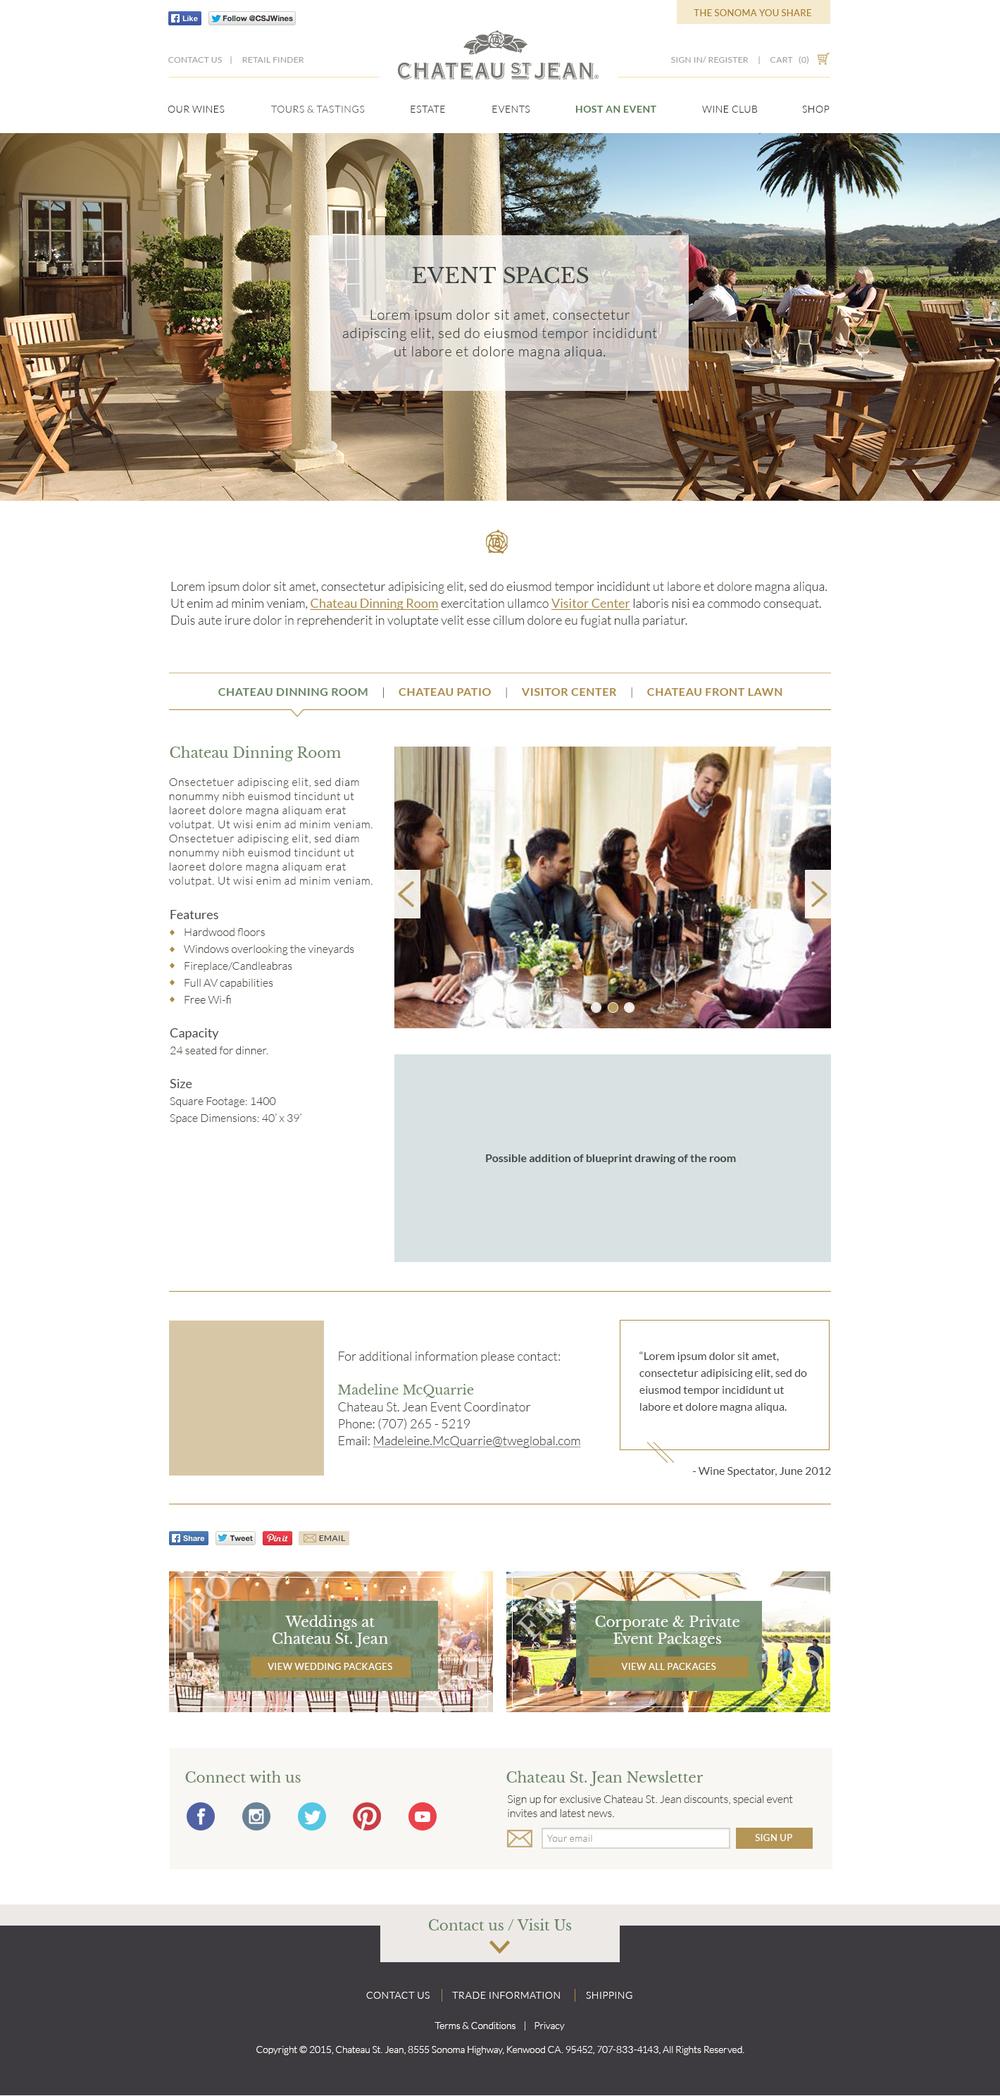 TRE01-018_CSJ-Website-Redesign_05HostanEvent_5.2EventSpaces.jpg